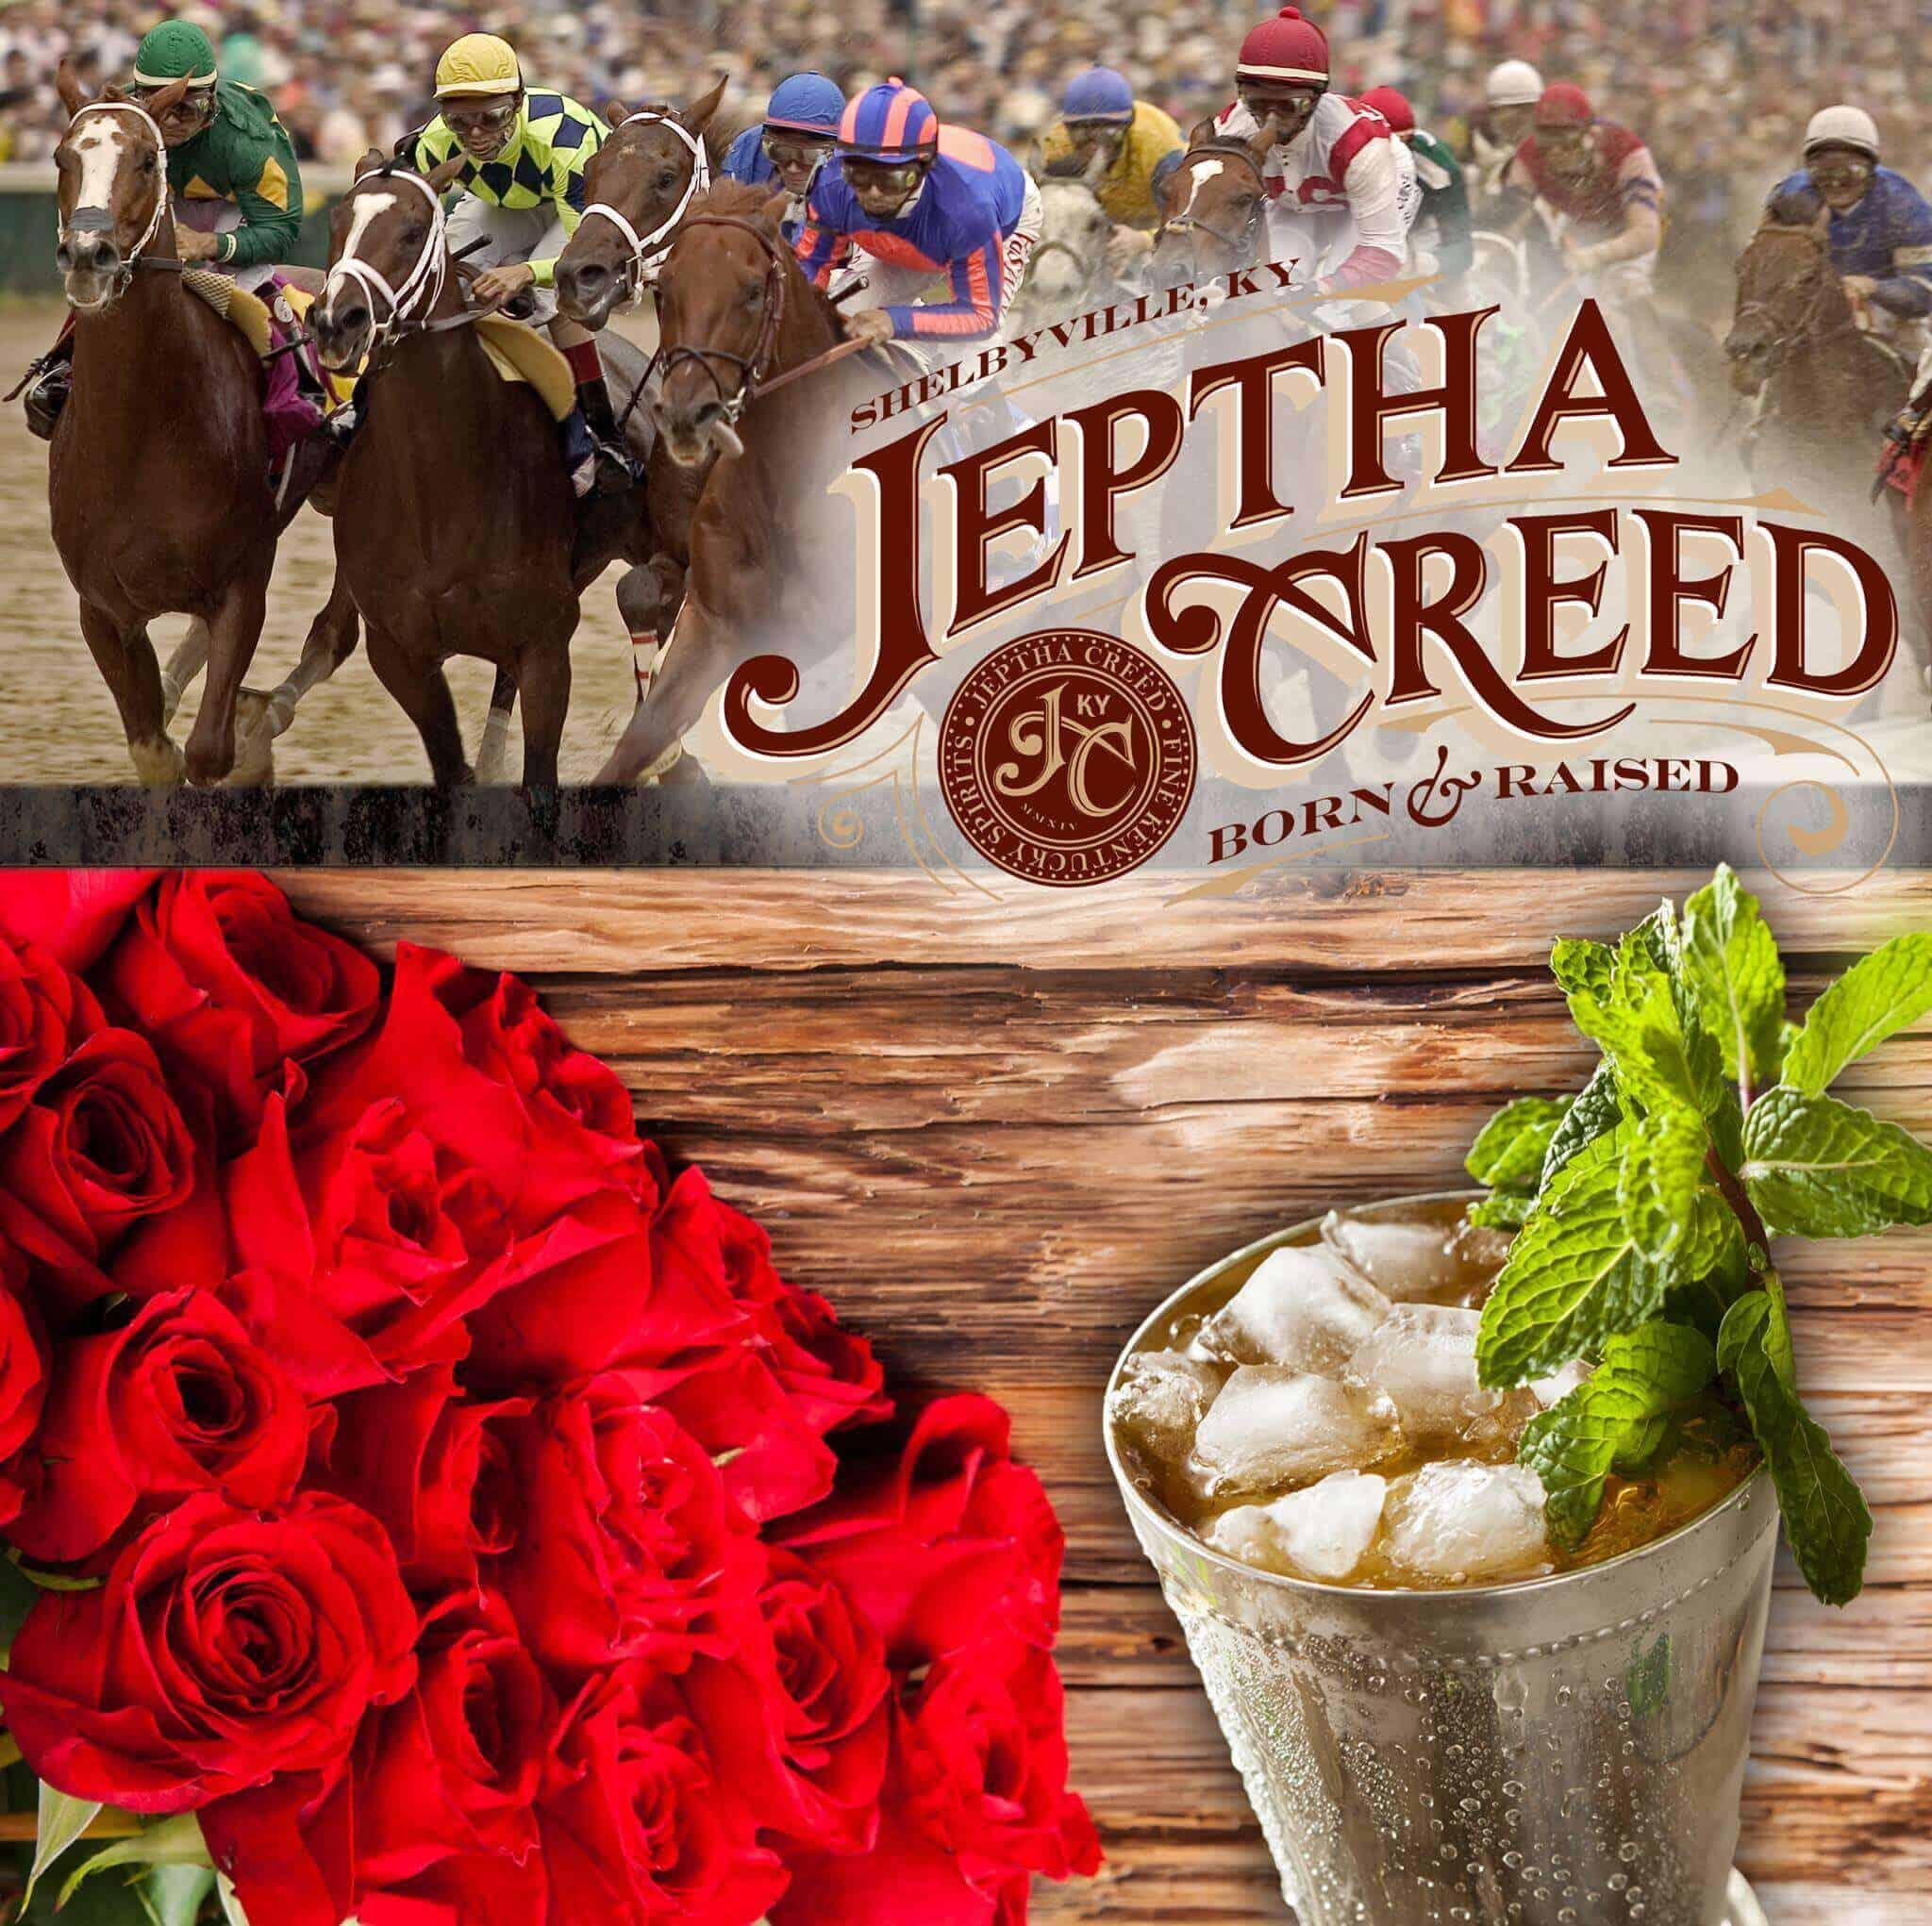 Jeptha Creed Jockeys Juleps Jeptha - Jeptha Creed Jockeys, Juleps, & Jeptha